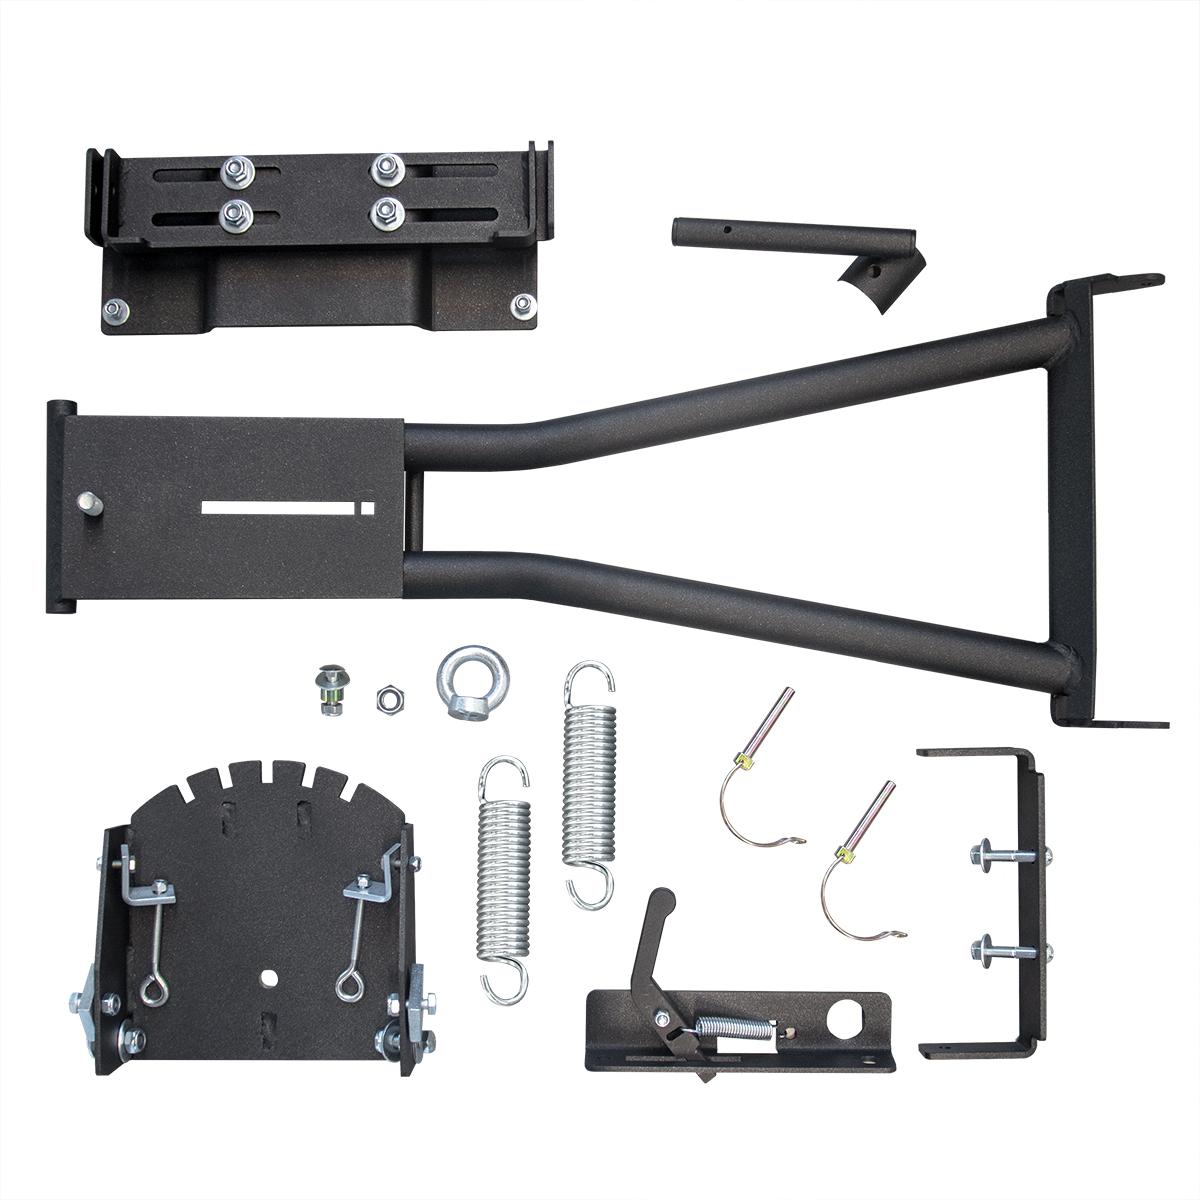 SHARK Adapter for Sweeping brushes & Snow Plow (Linhai T-Boss 550 EPS)